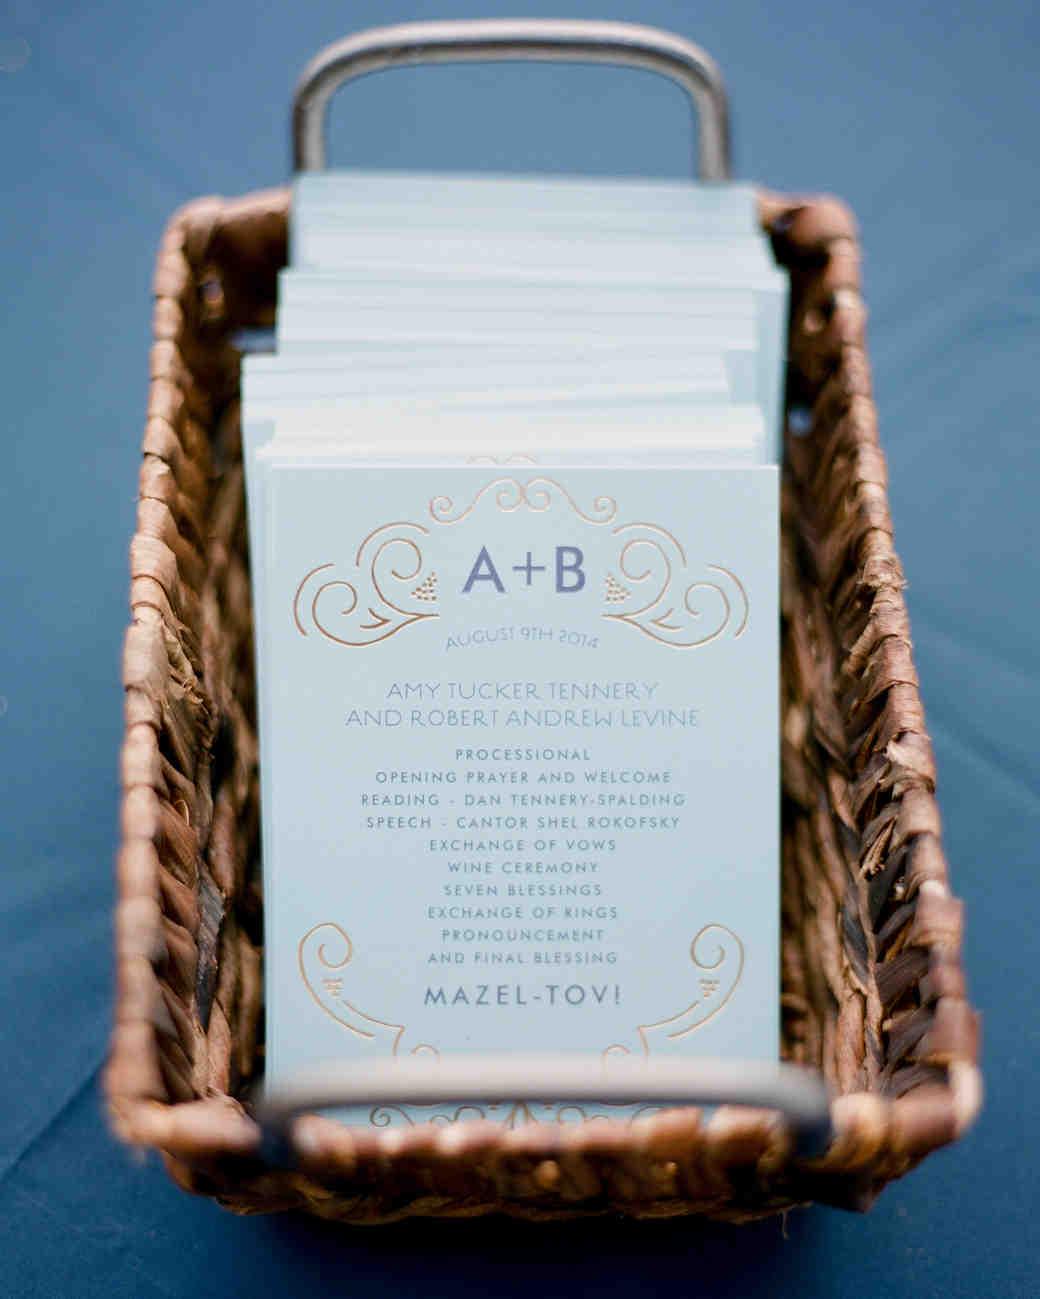 44 Perfect Wedding Ceremony Programs | Martha Stewart Weddings